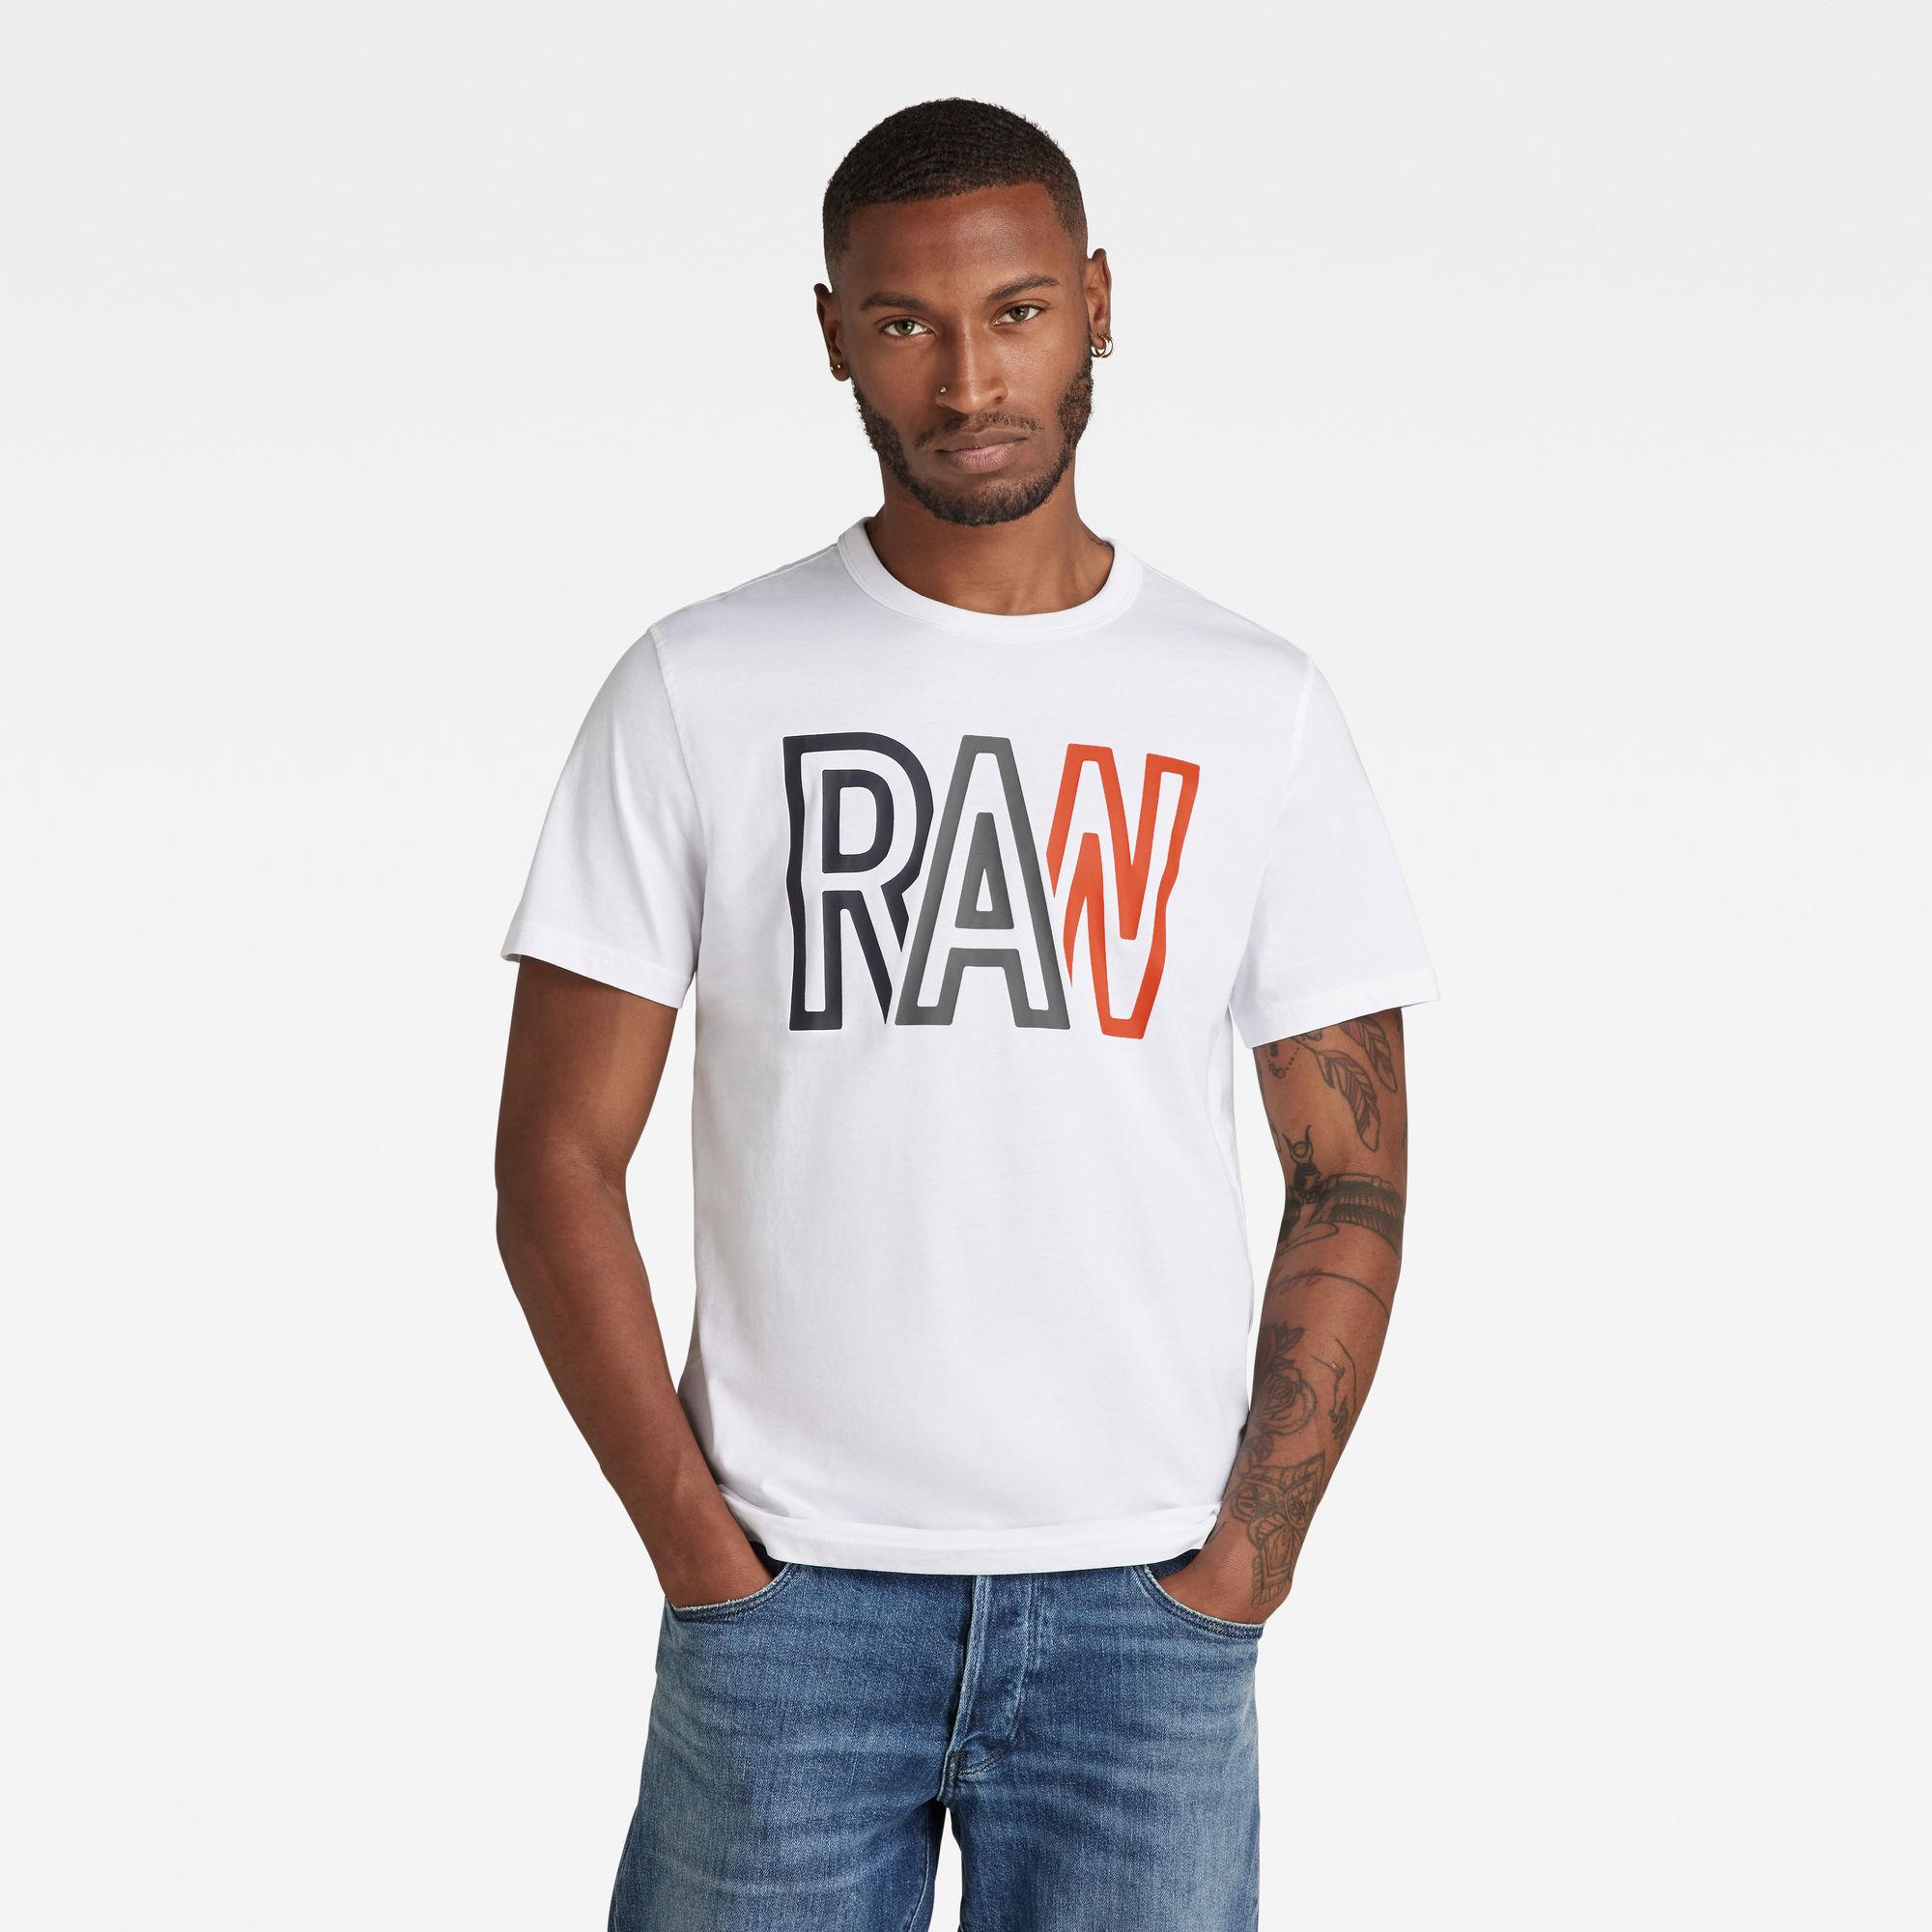 G-Star RAW Heren Raw T-Shirt Wit